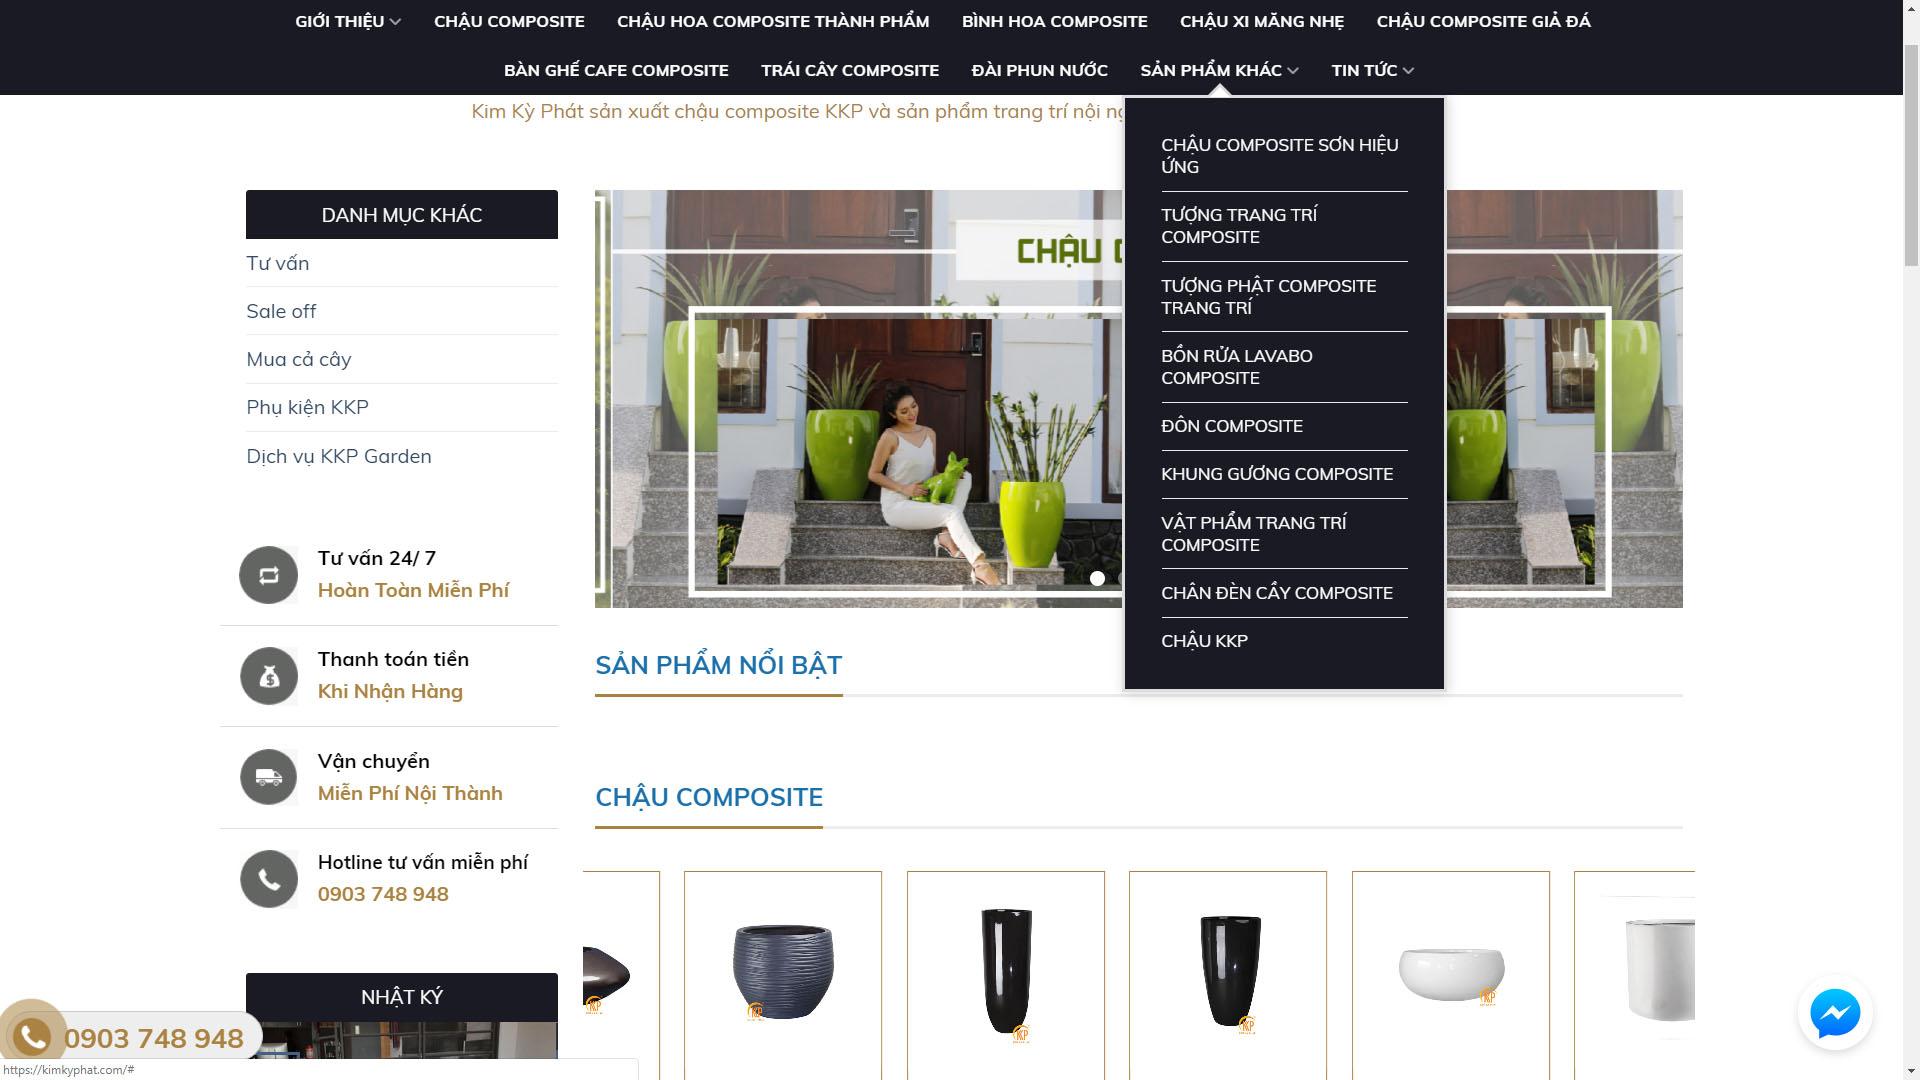 hướng dẫn mua hàng chậu composite